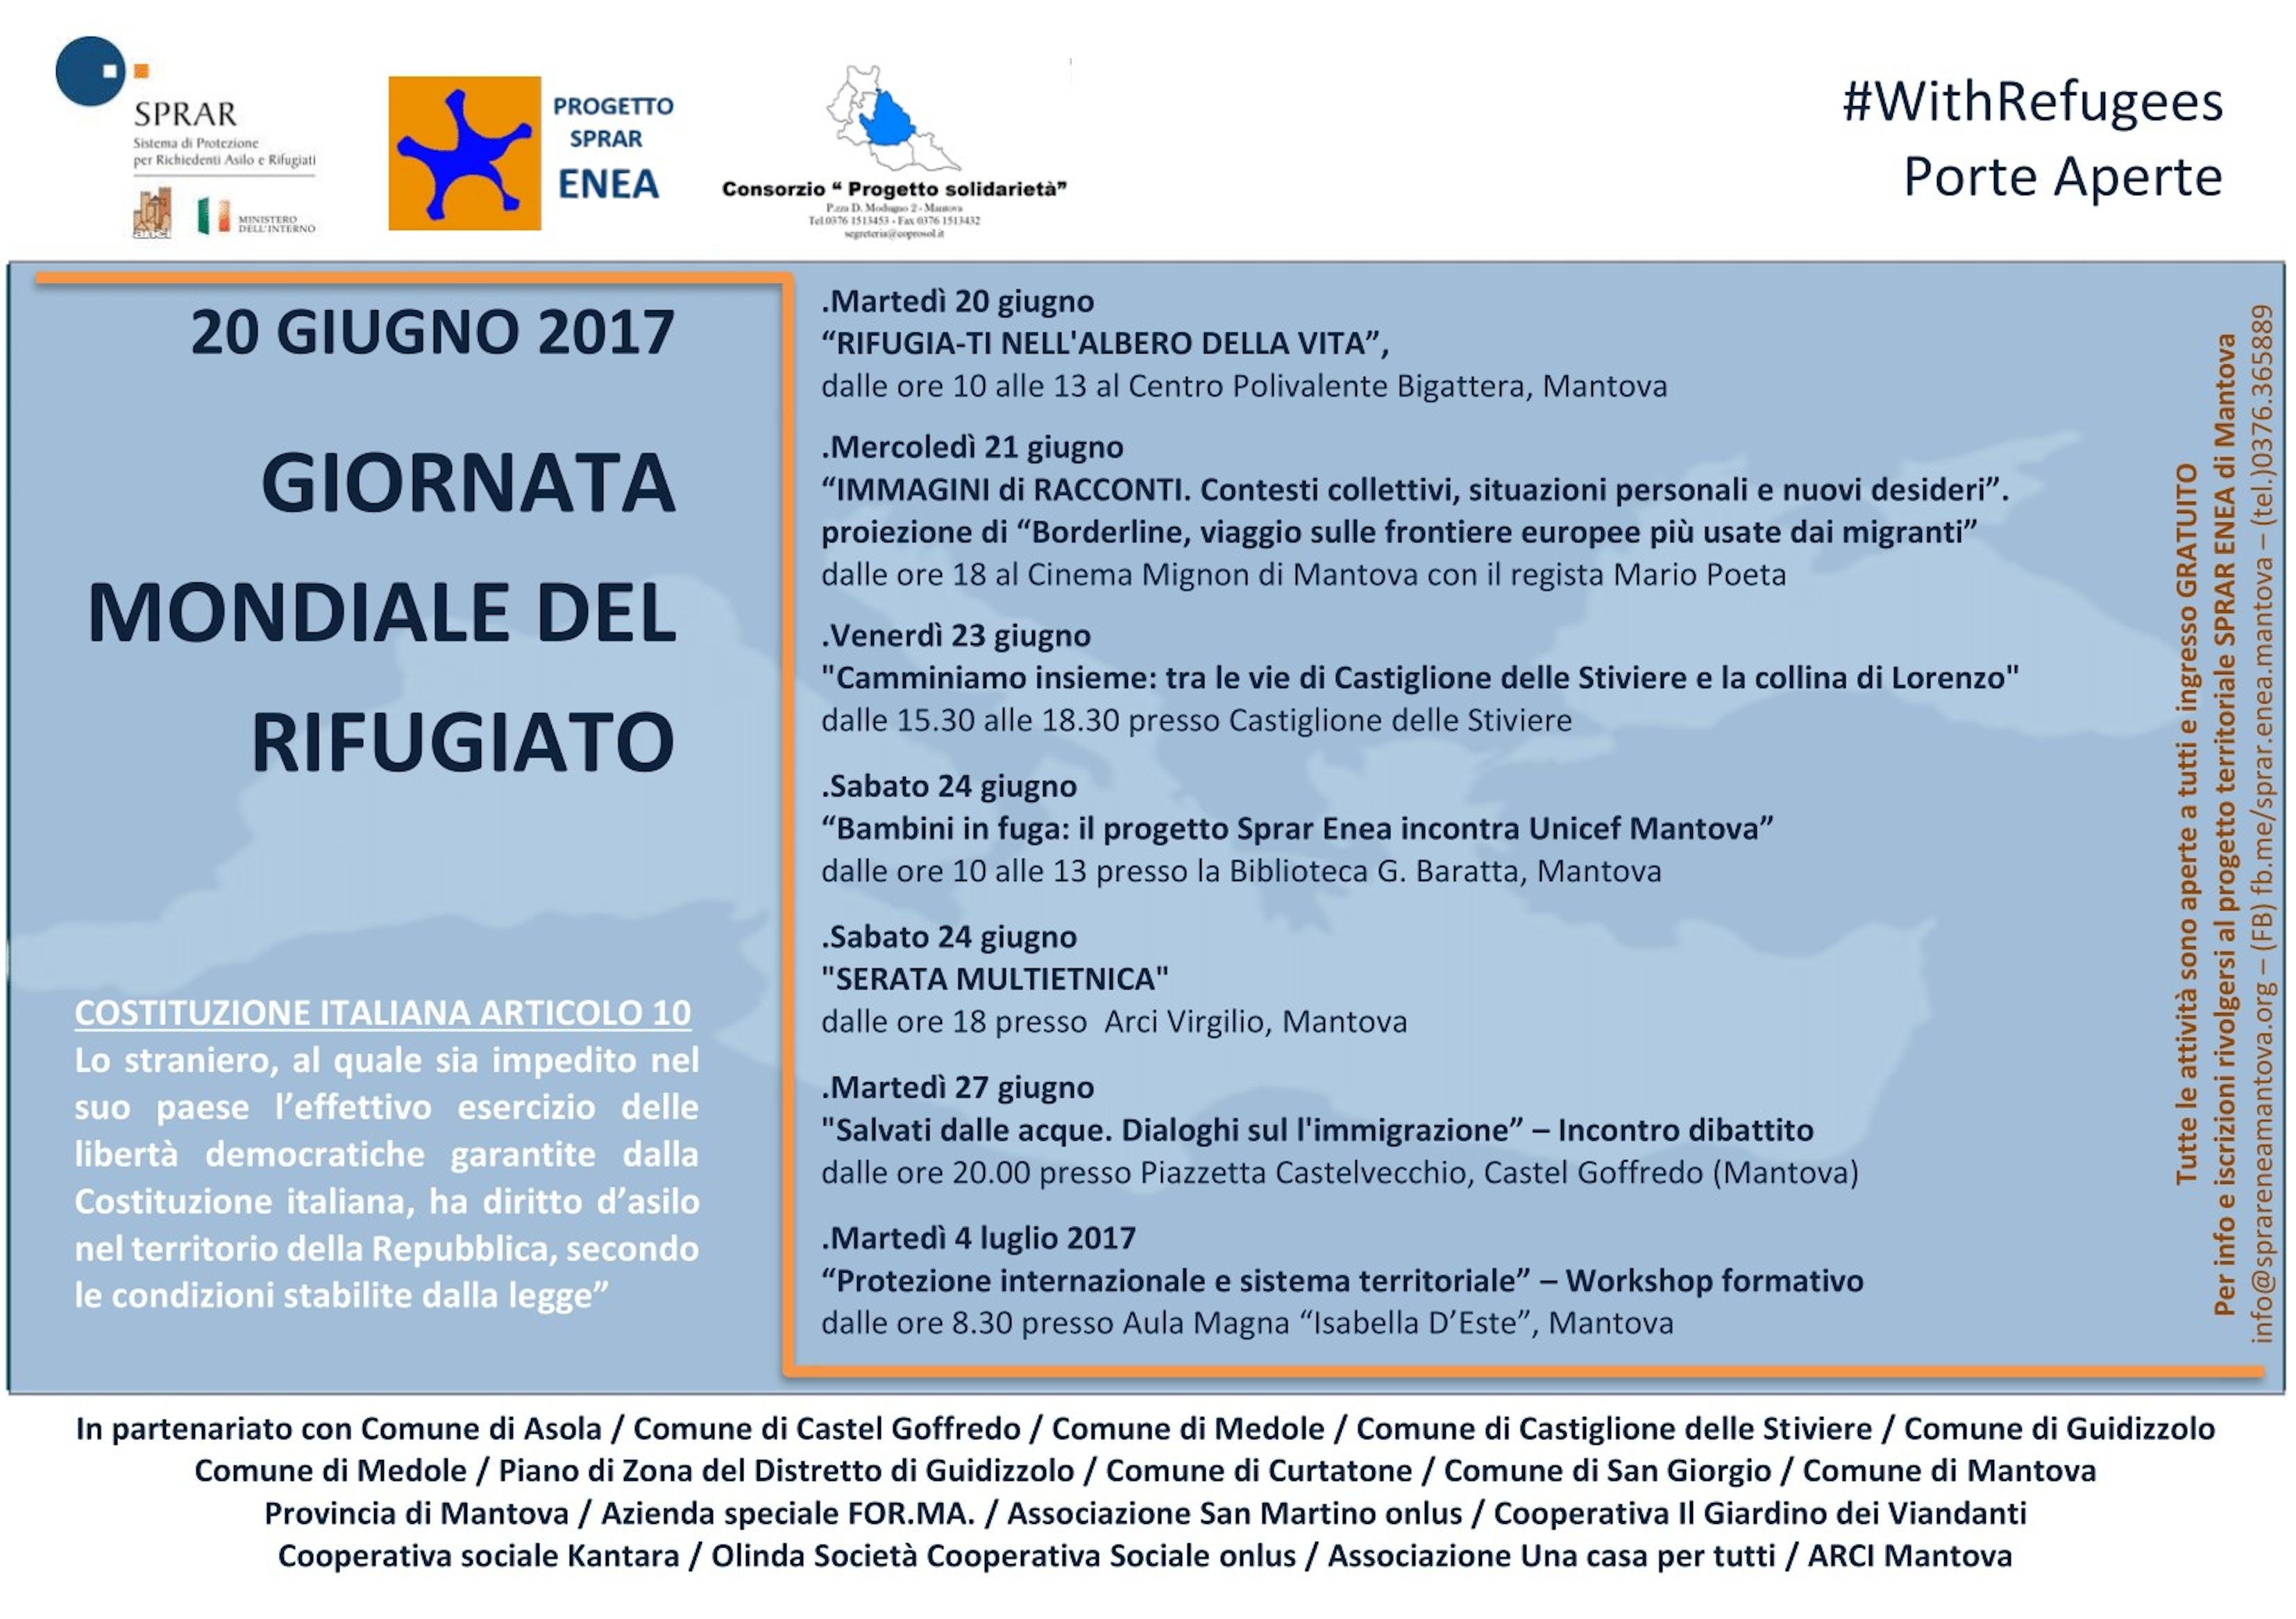 UNICEF e lo SPRAR Enea, insieme a Mantova